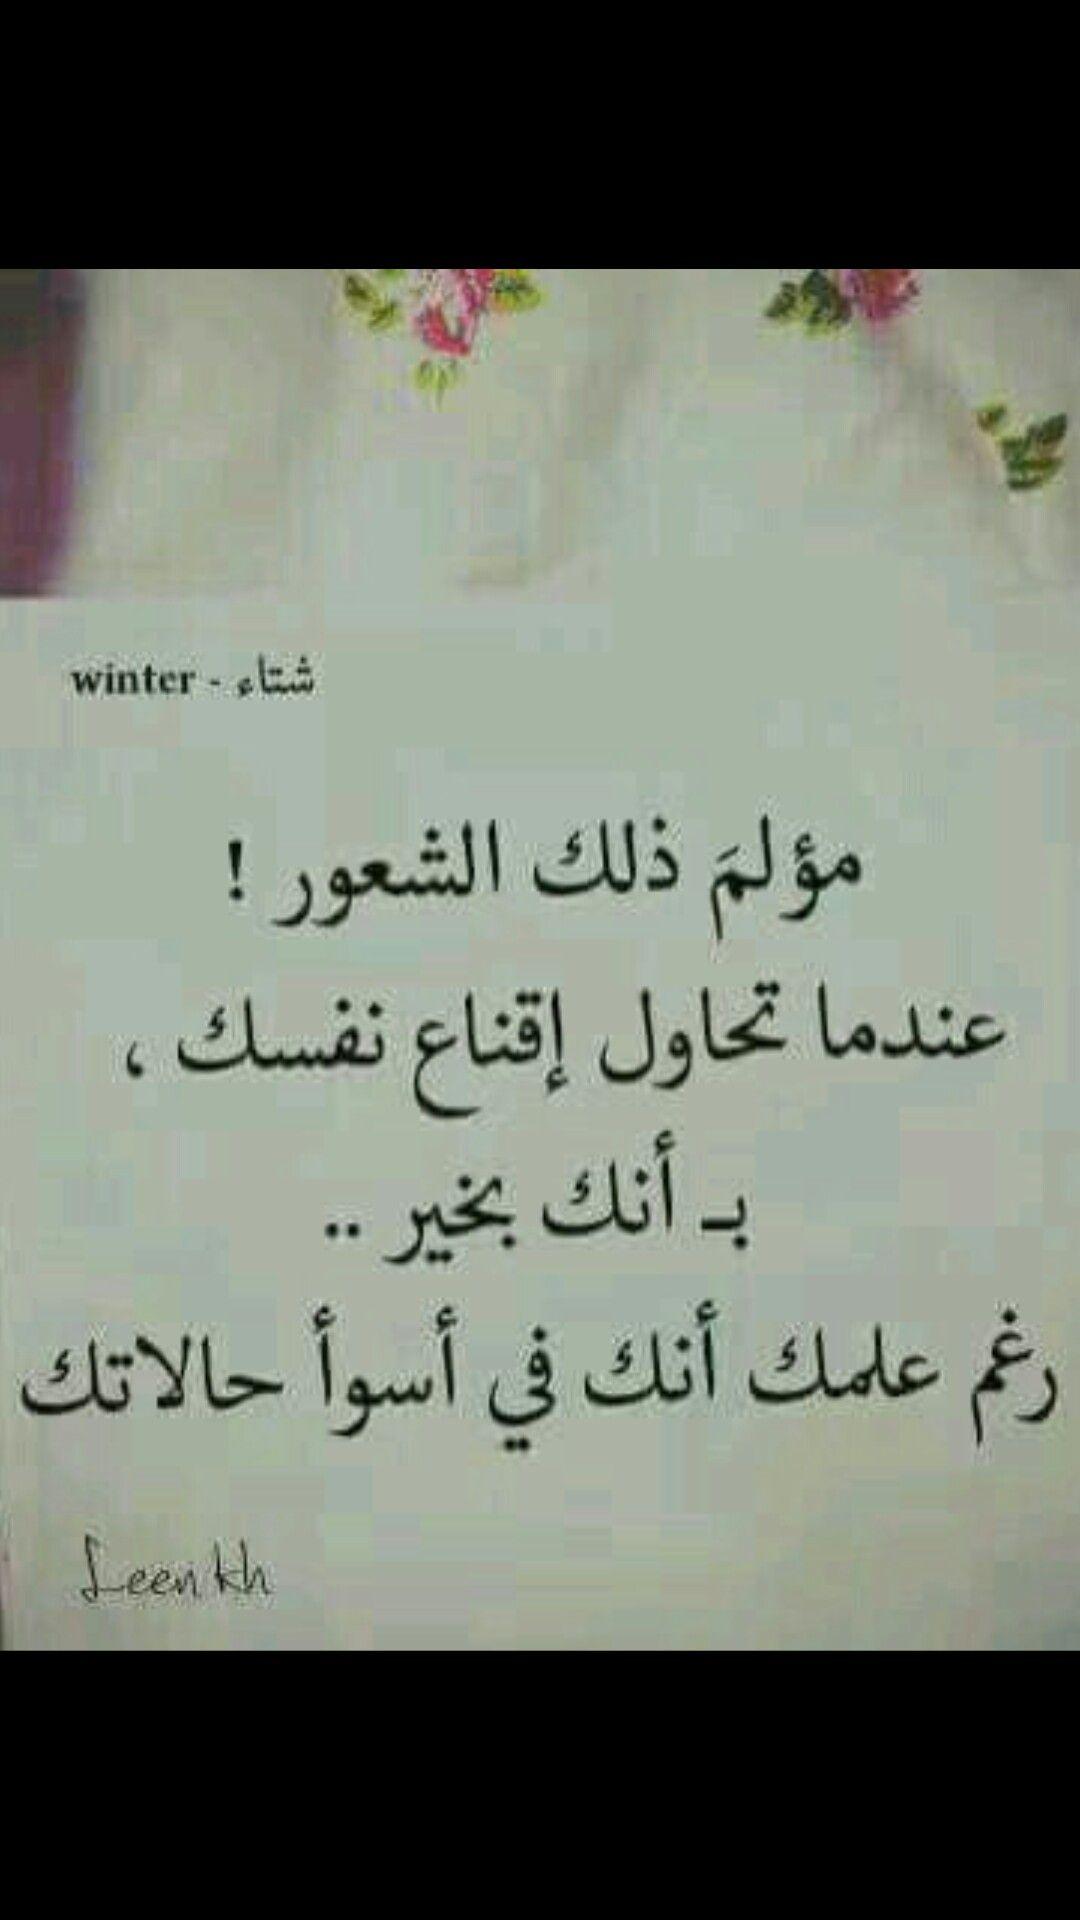 Pin By Gharib Makld On كلمات لها معنى Quotes Arabic Quotes Arabic